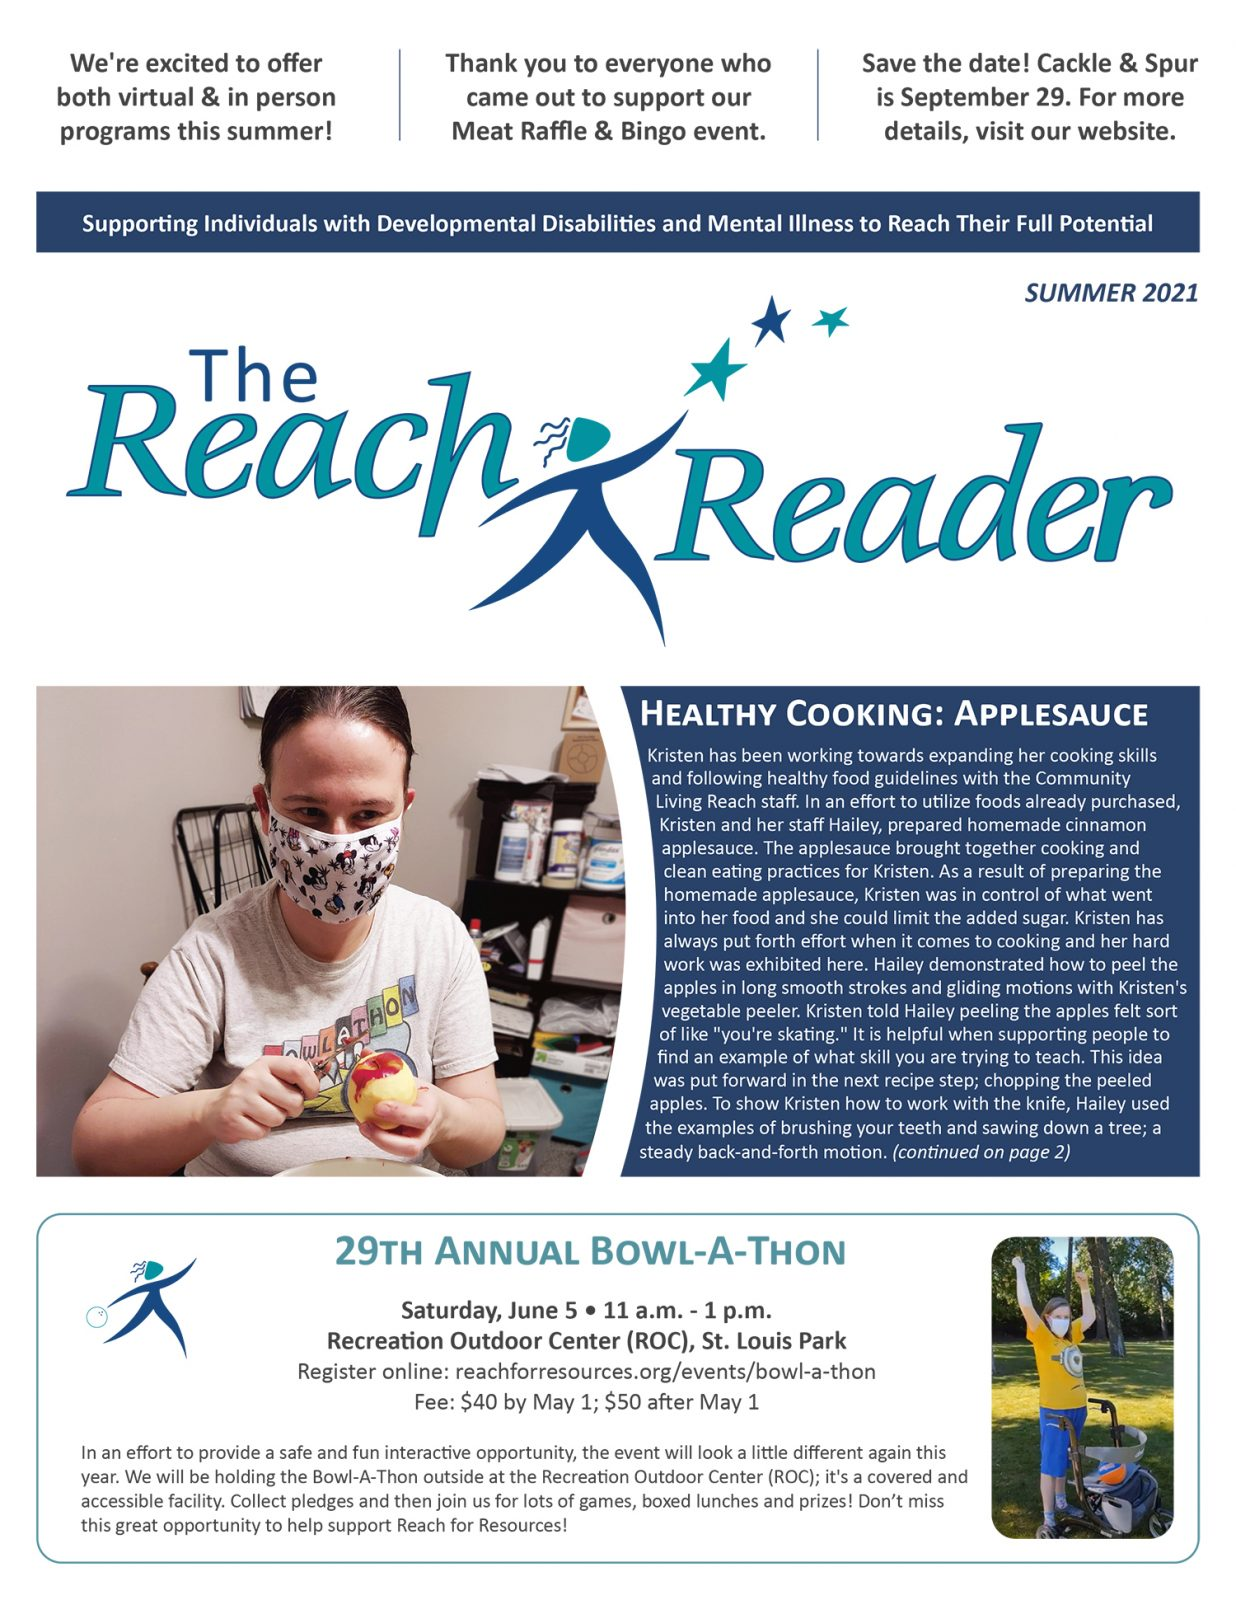 Summer 2021 Reach Reader